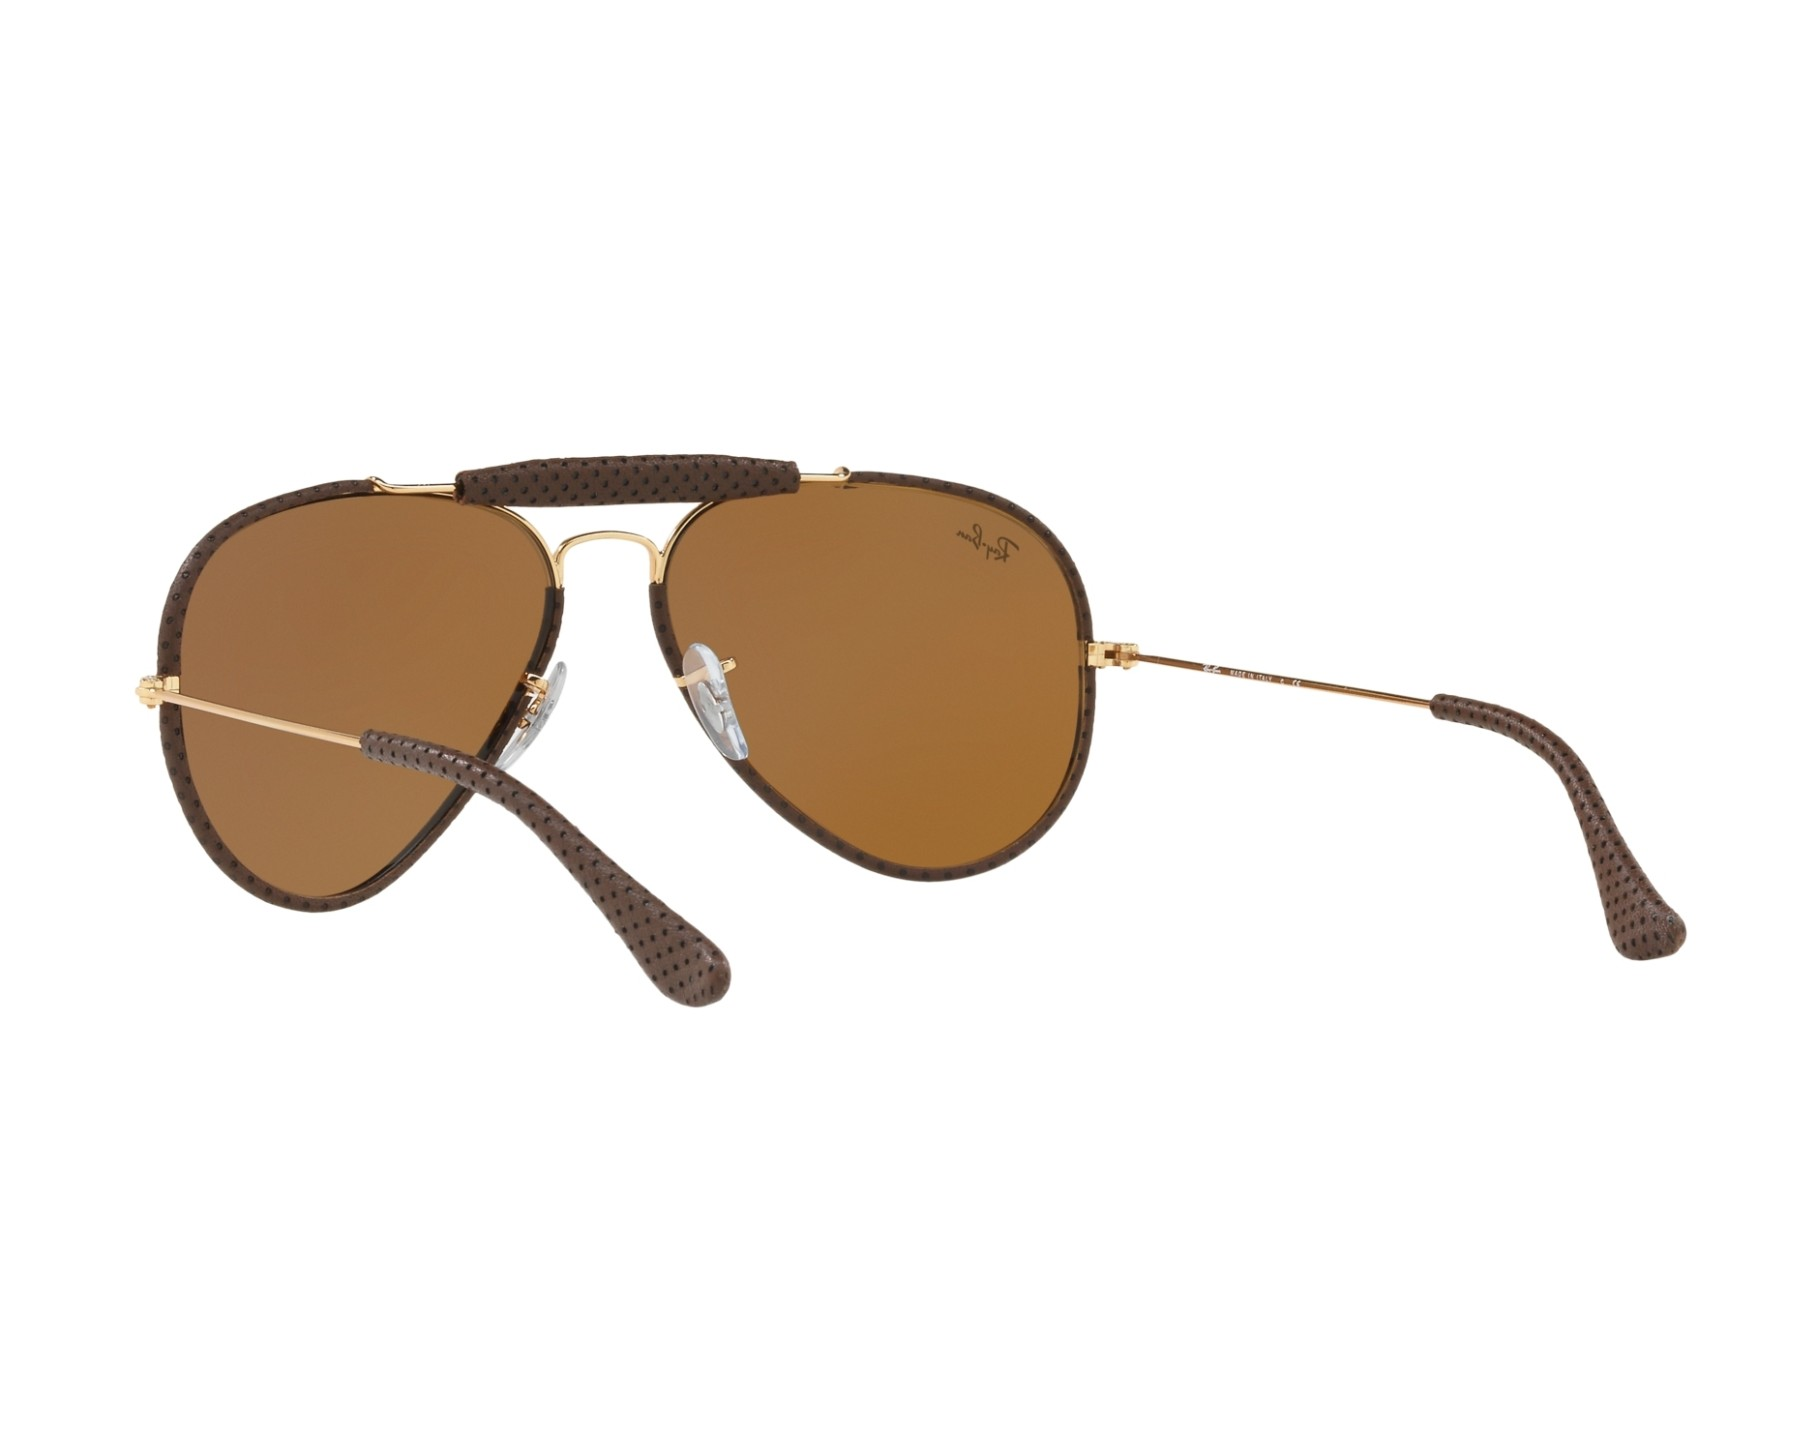 71853249dc58e Sunglasses Ray-Ban RB-3422-Q 9041 - Brown Gold 360 degree view